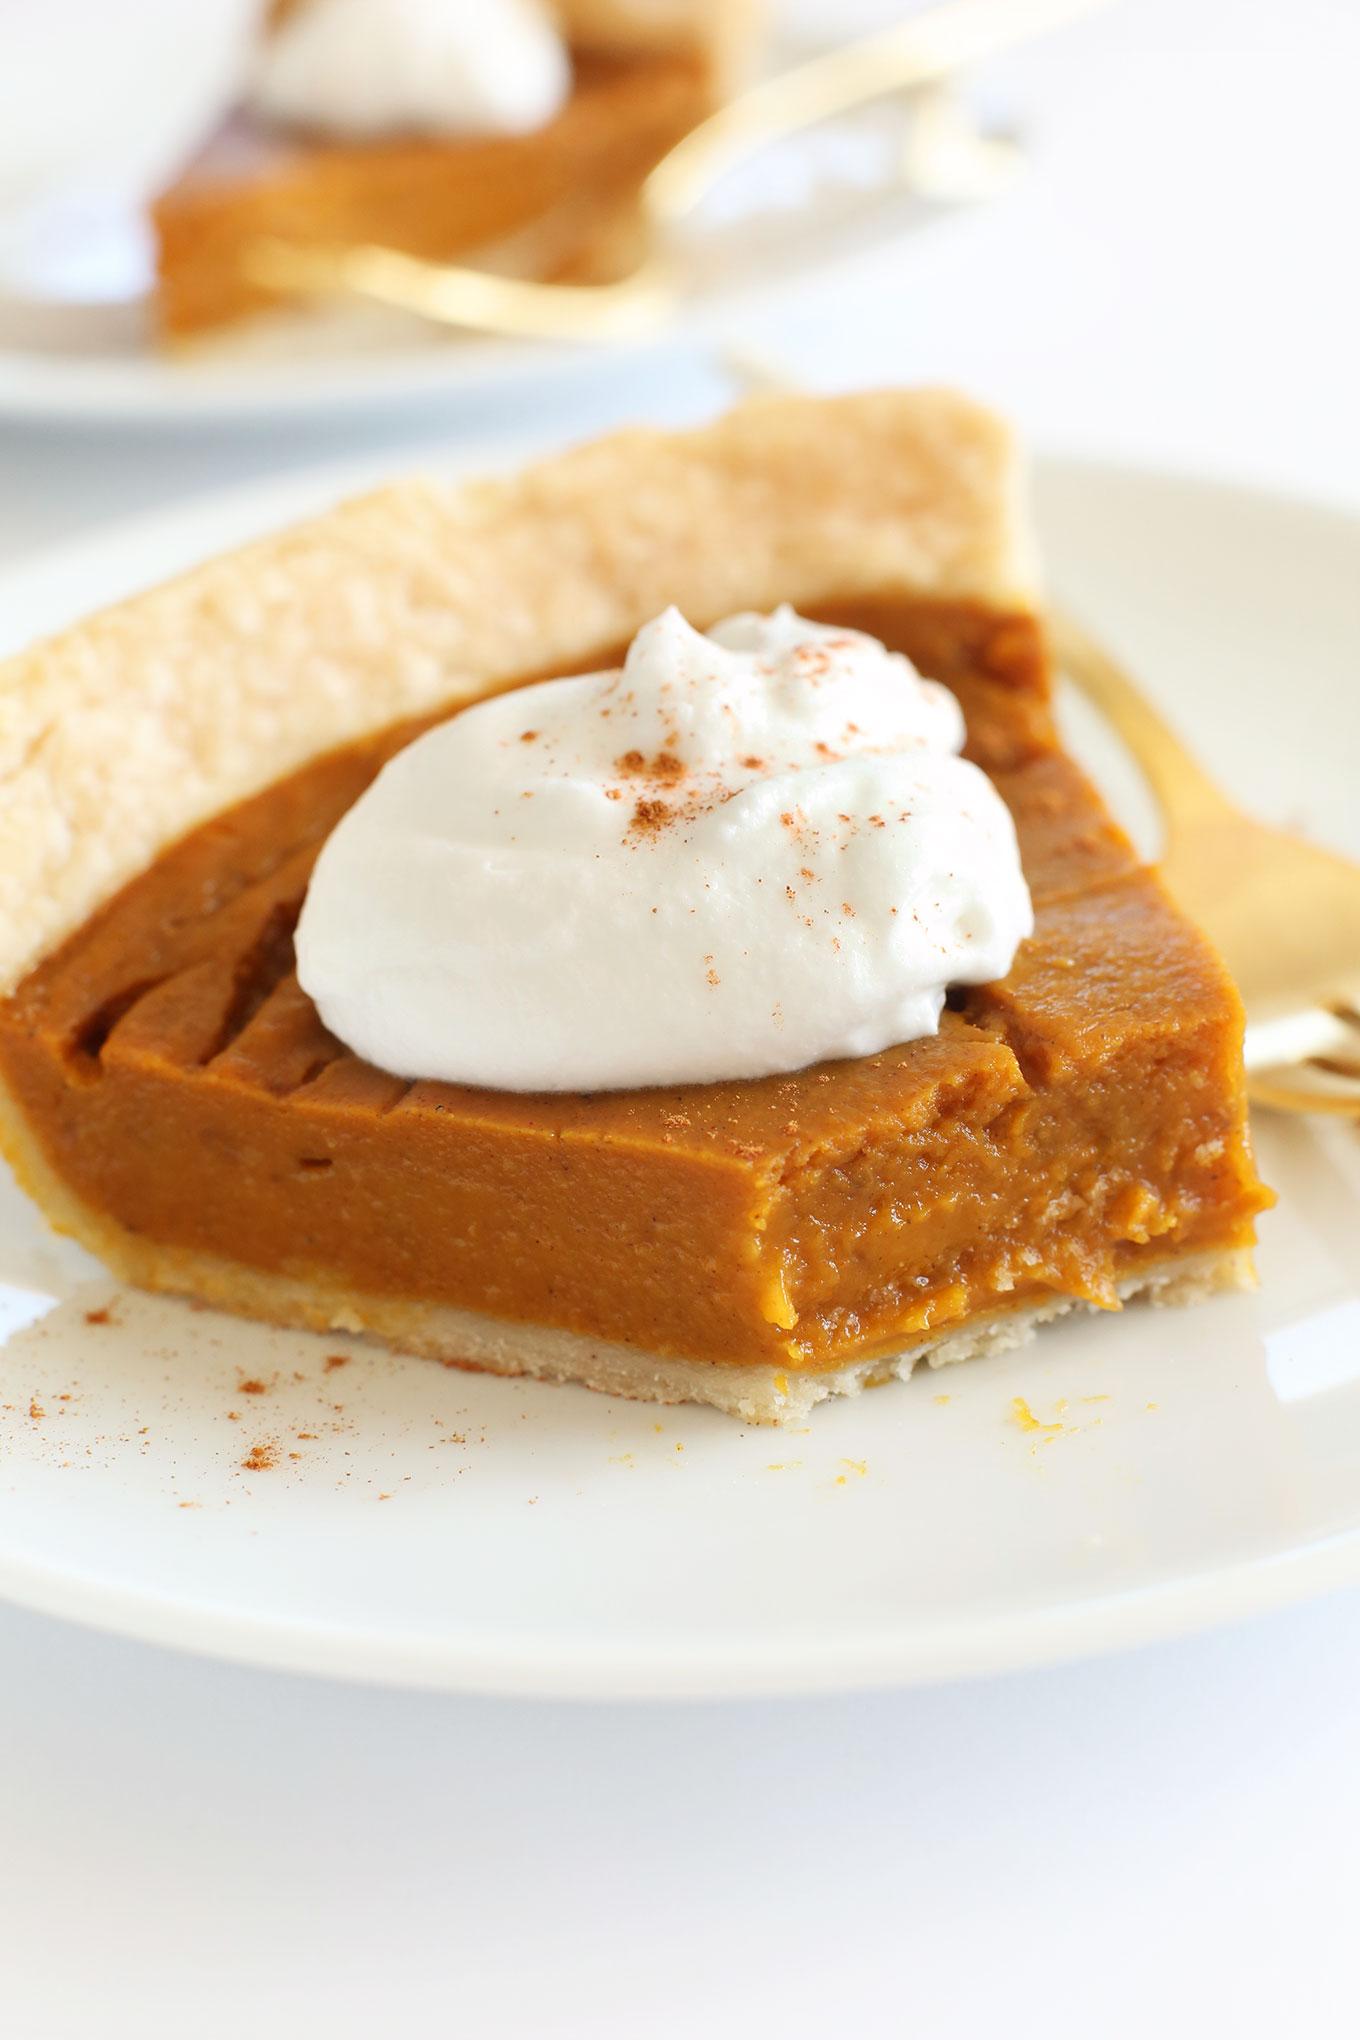 Partially eaten slice of delicious vegan gluten-free pumpkin pie